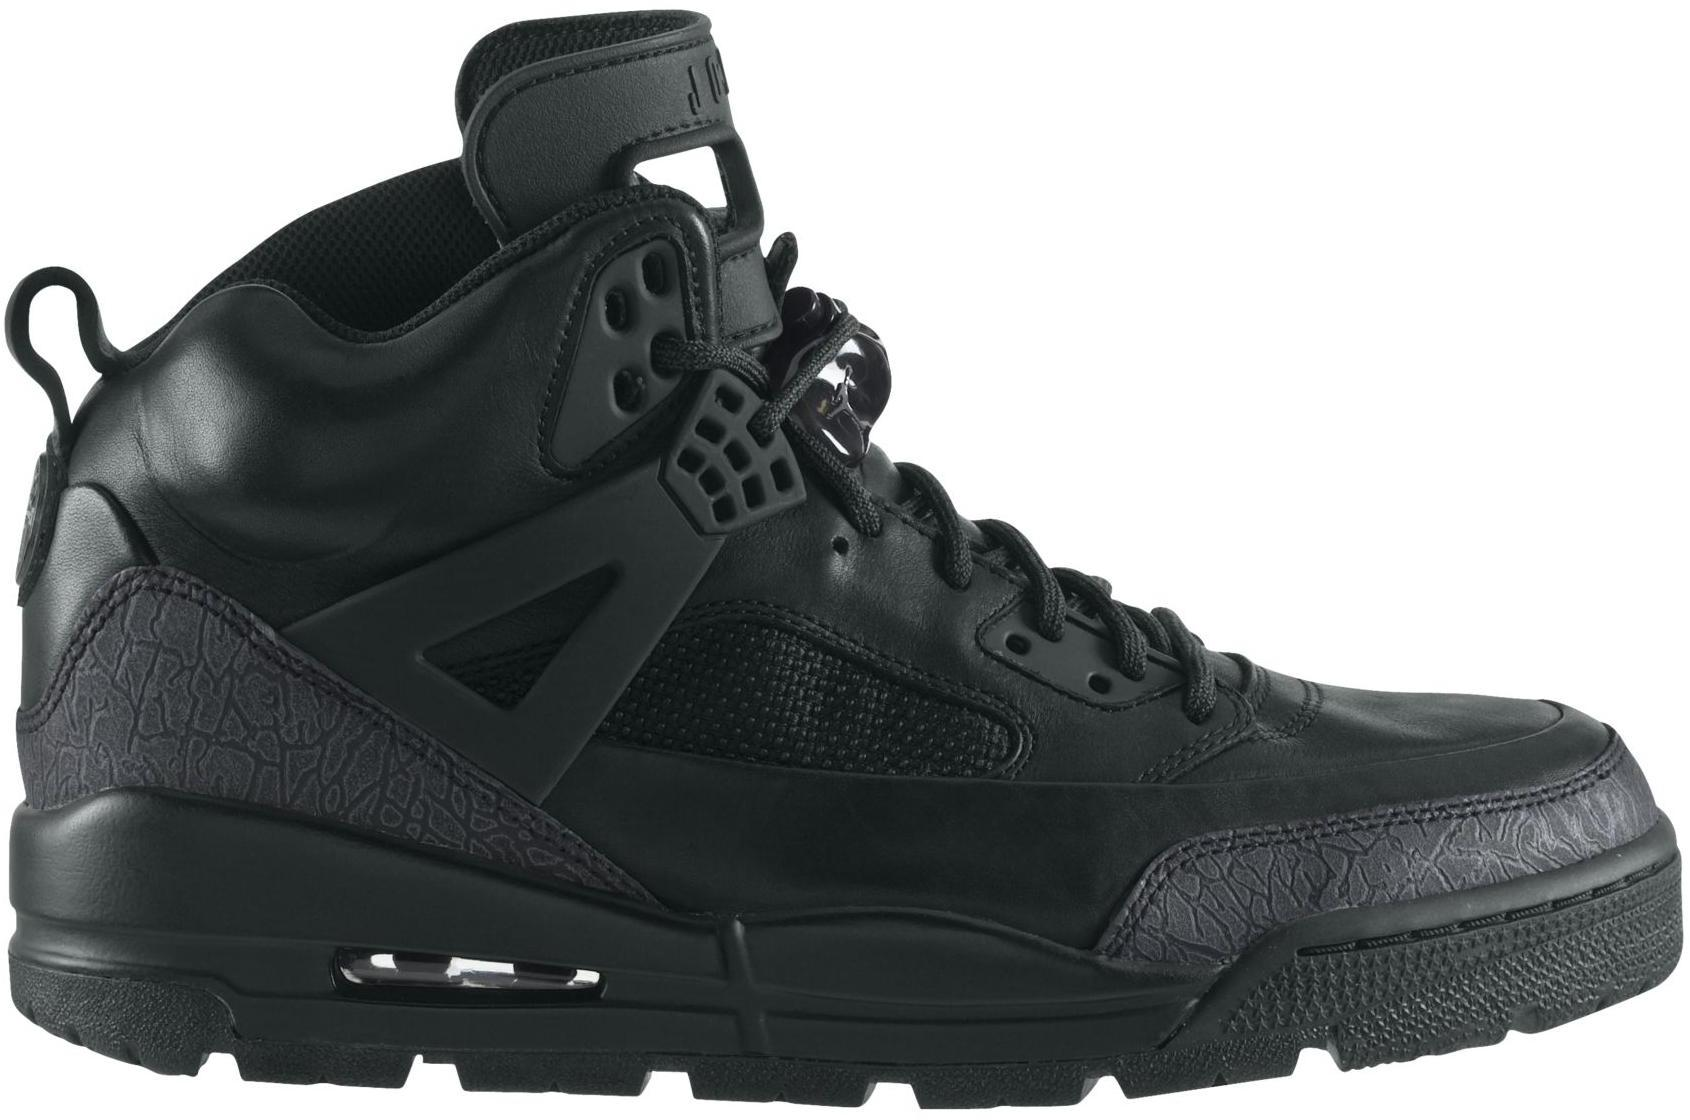 Jordan Spizike Boot Black Anthracite